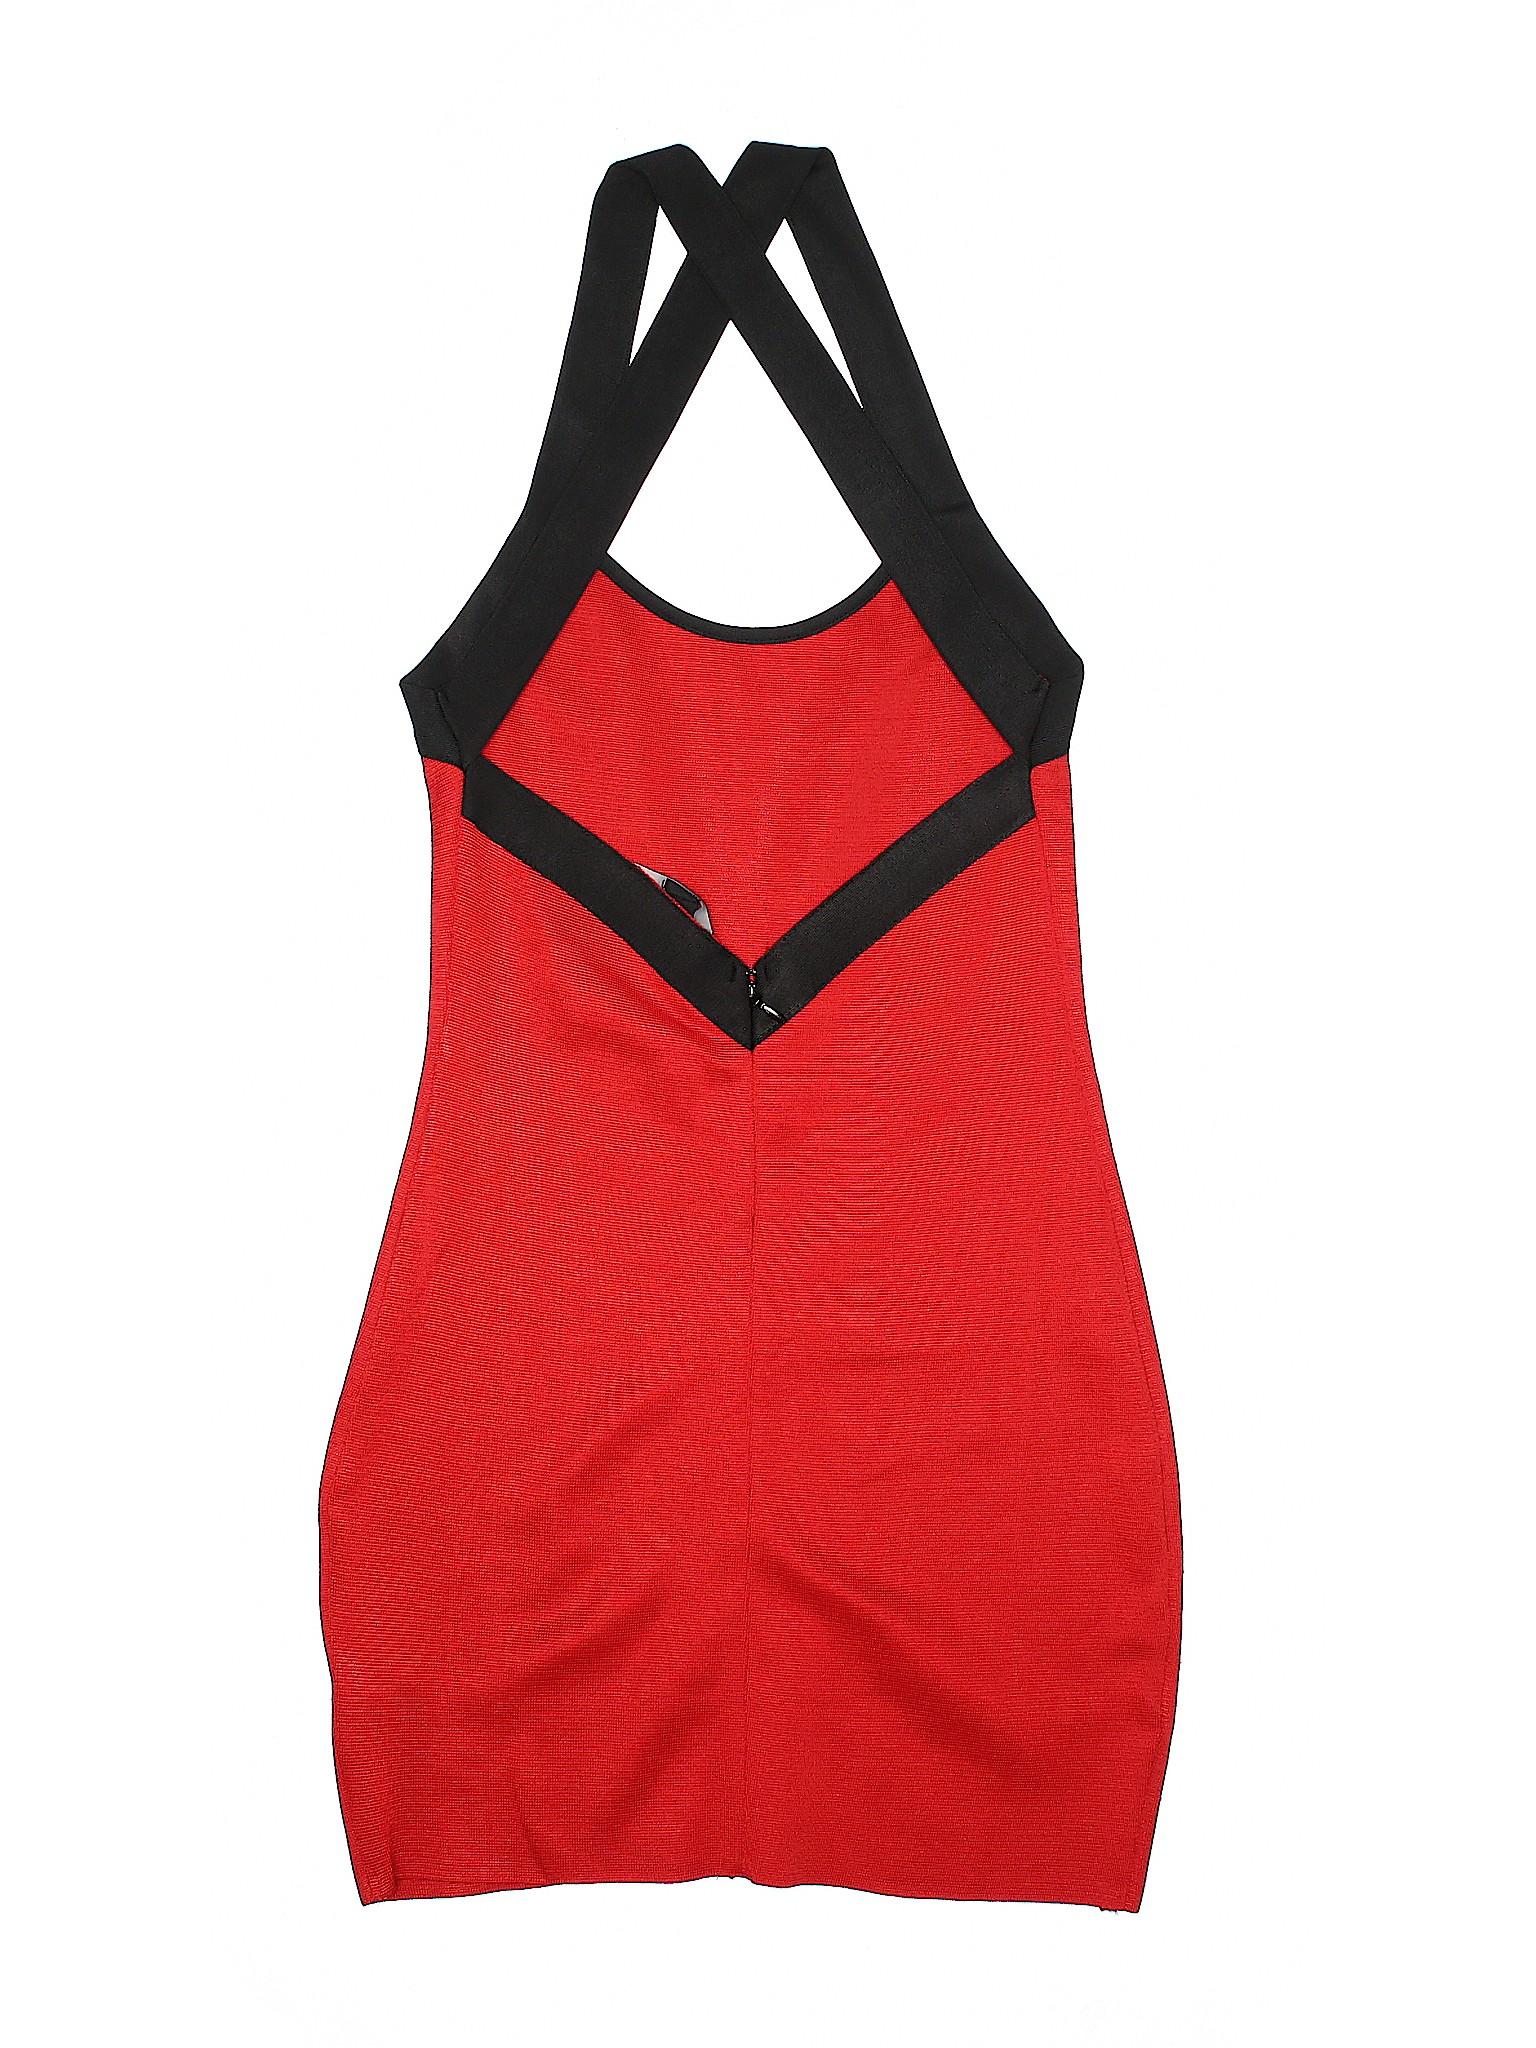 Casual Dress Forever Boutique 21 winter qRt4z